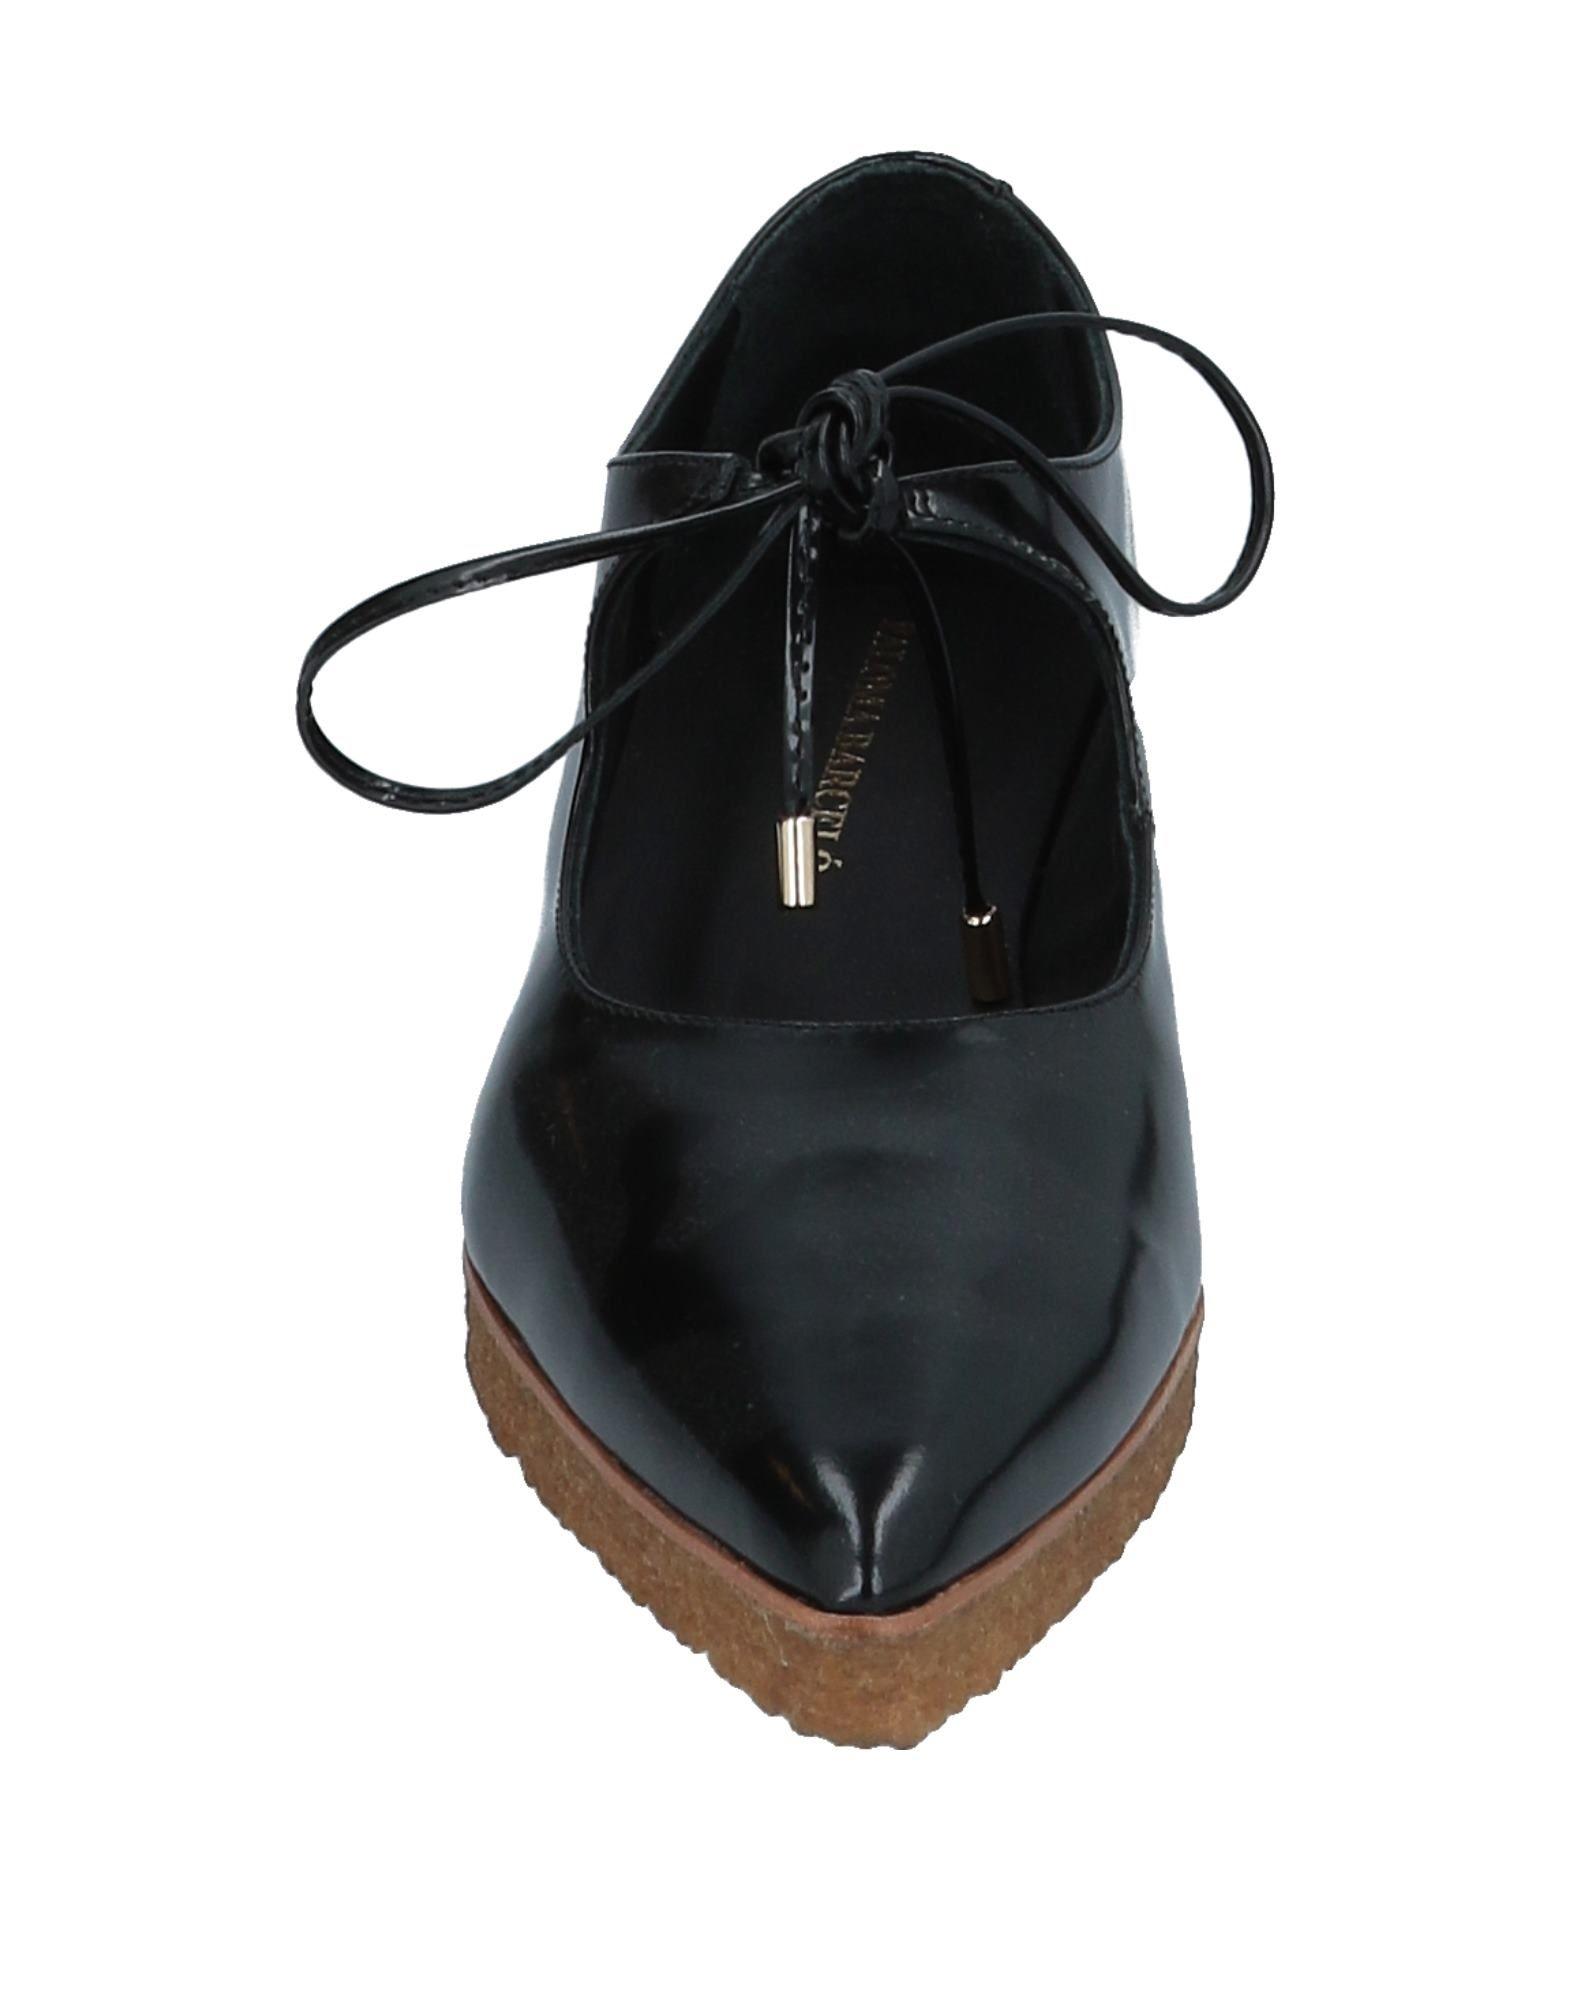 Stilvolle Paloma billige Schuhe Paloma Stilvolle Barceló Pumps Damen 11509493LI 799000